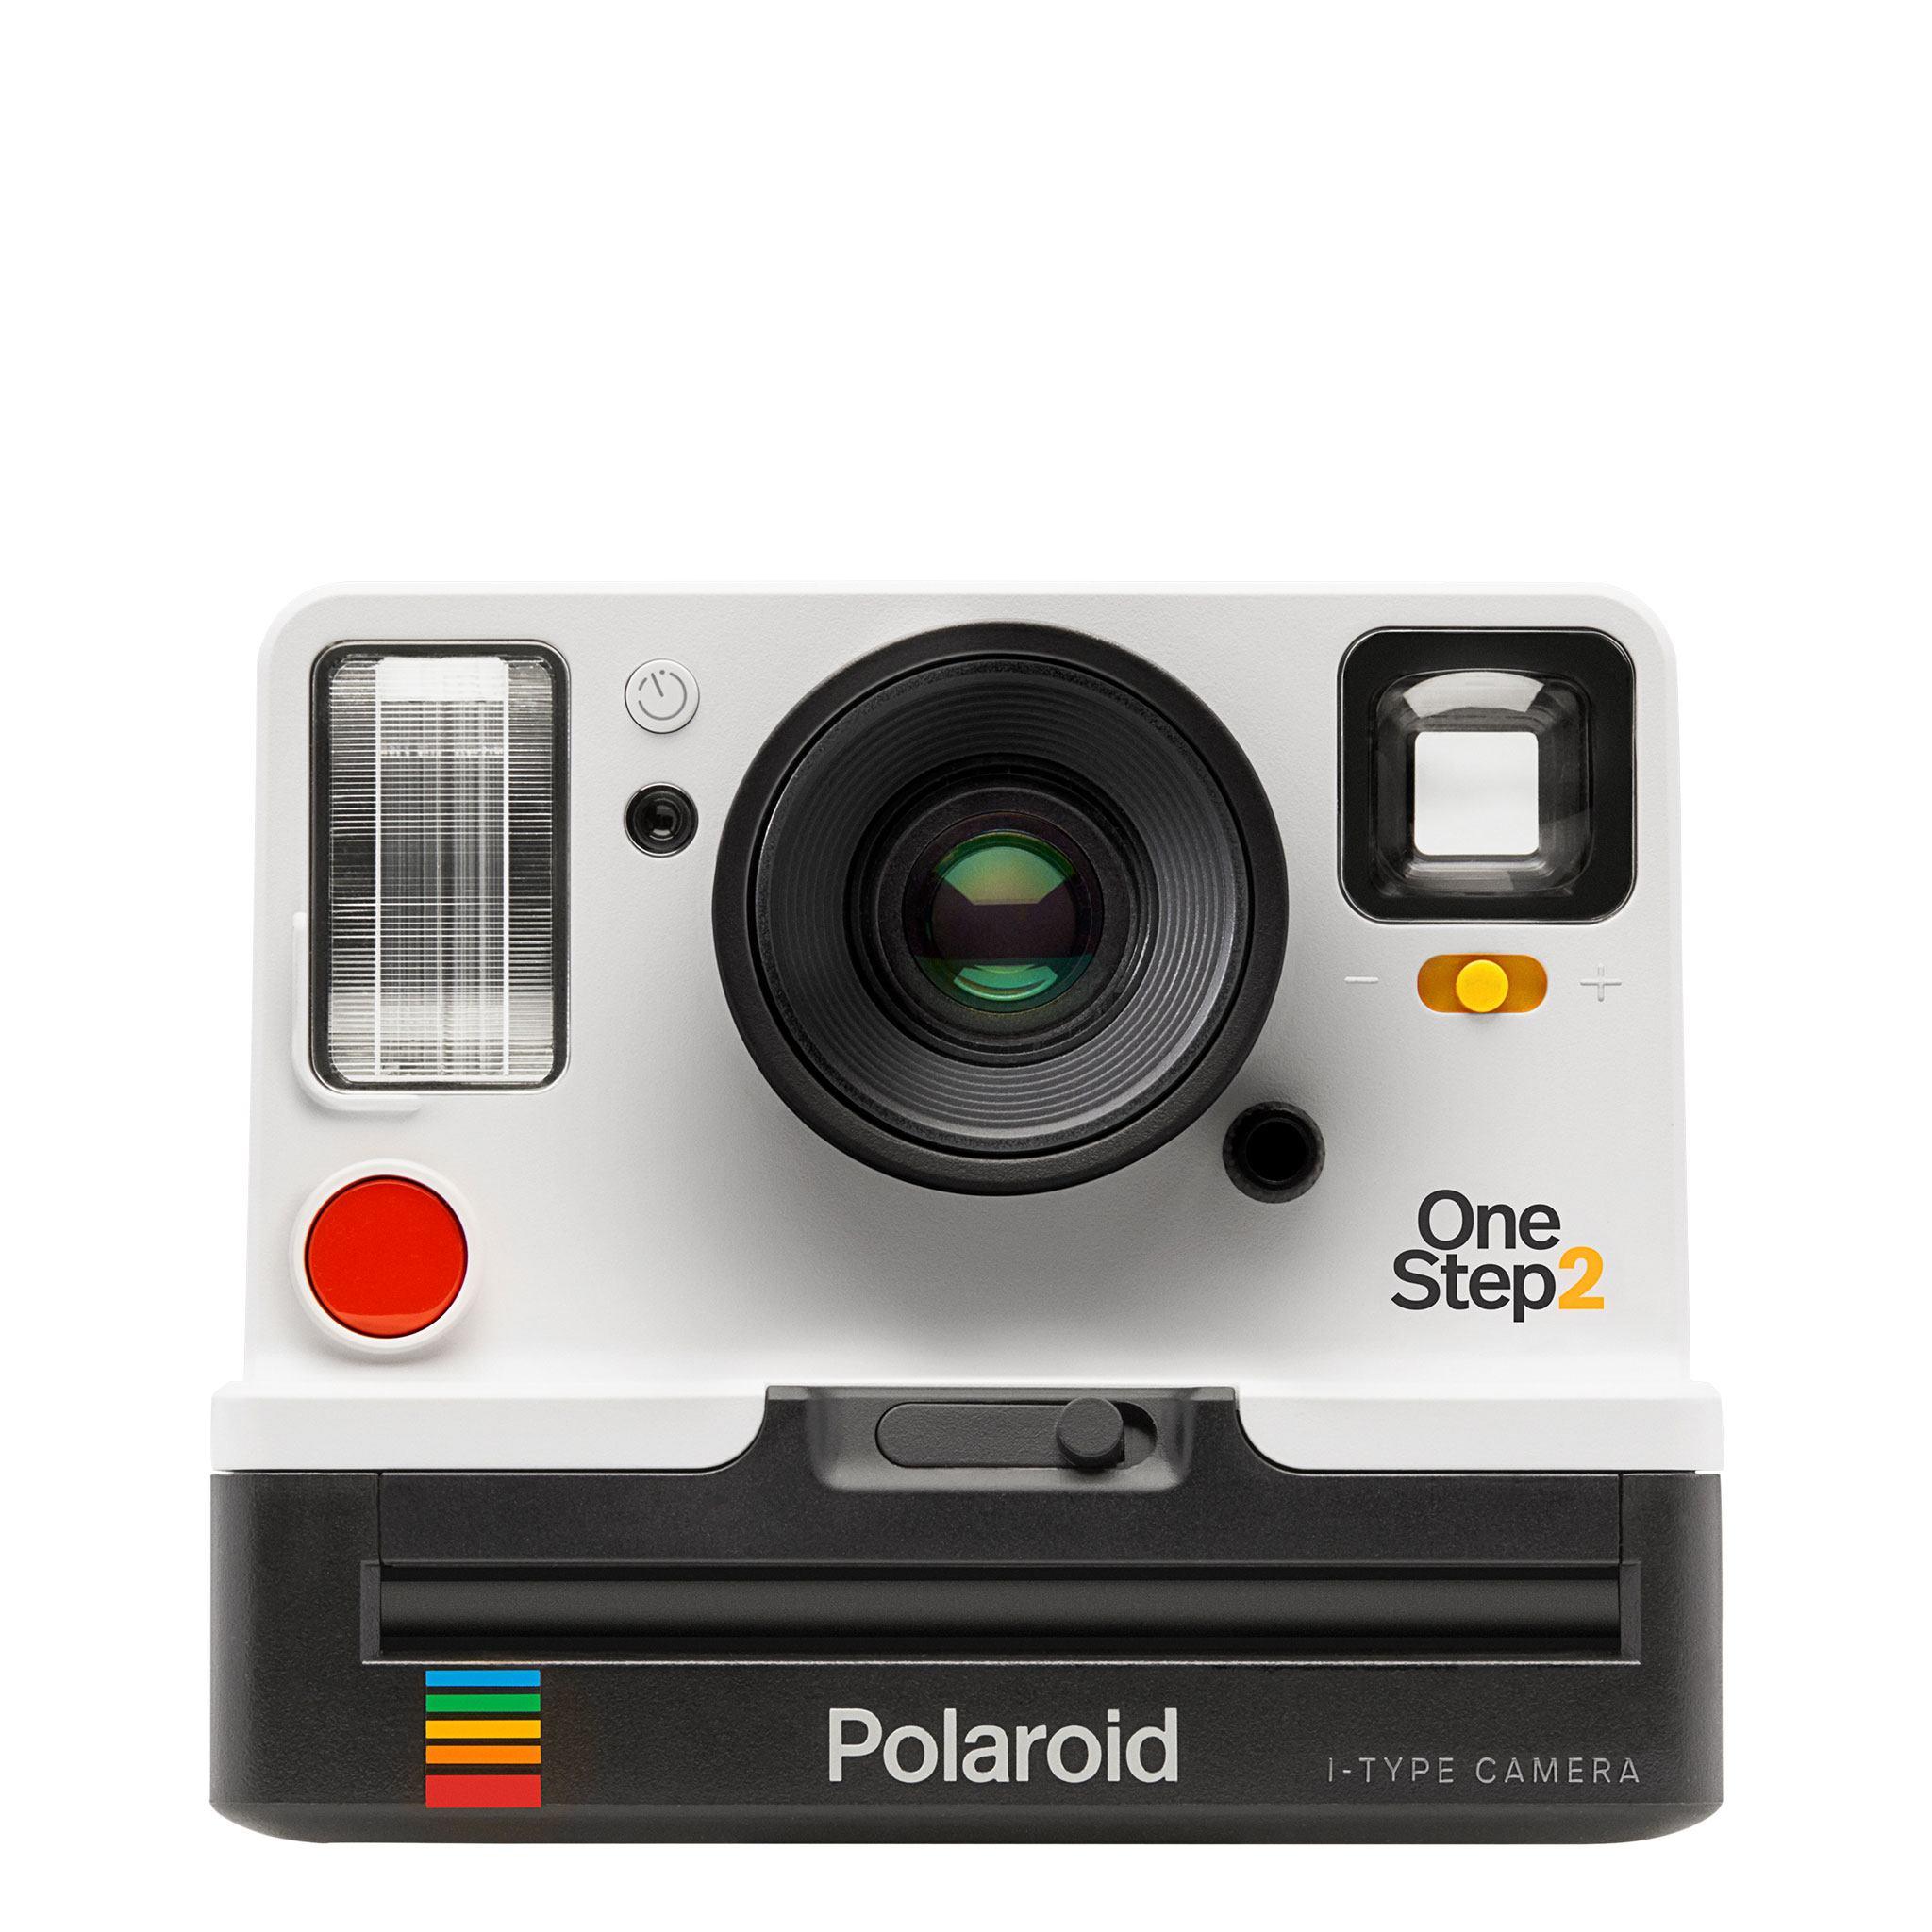 Camera clipart polaroid camera. Which should i buy